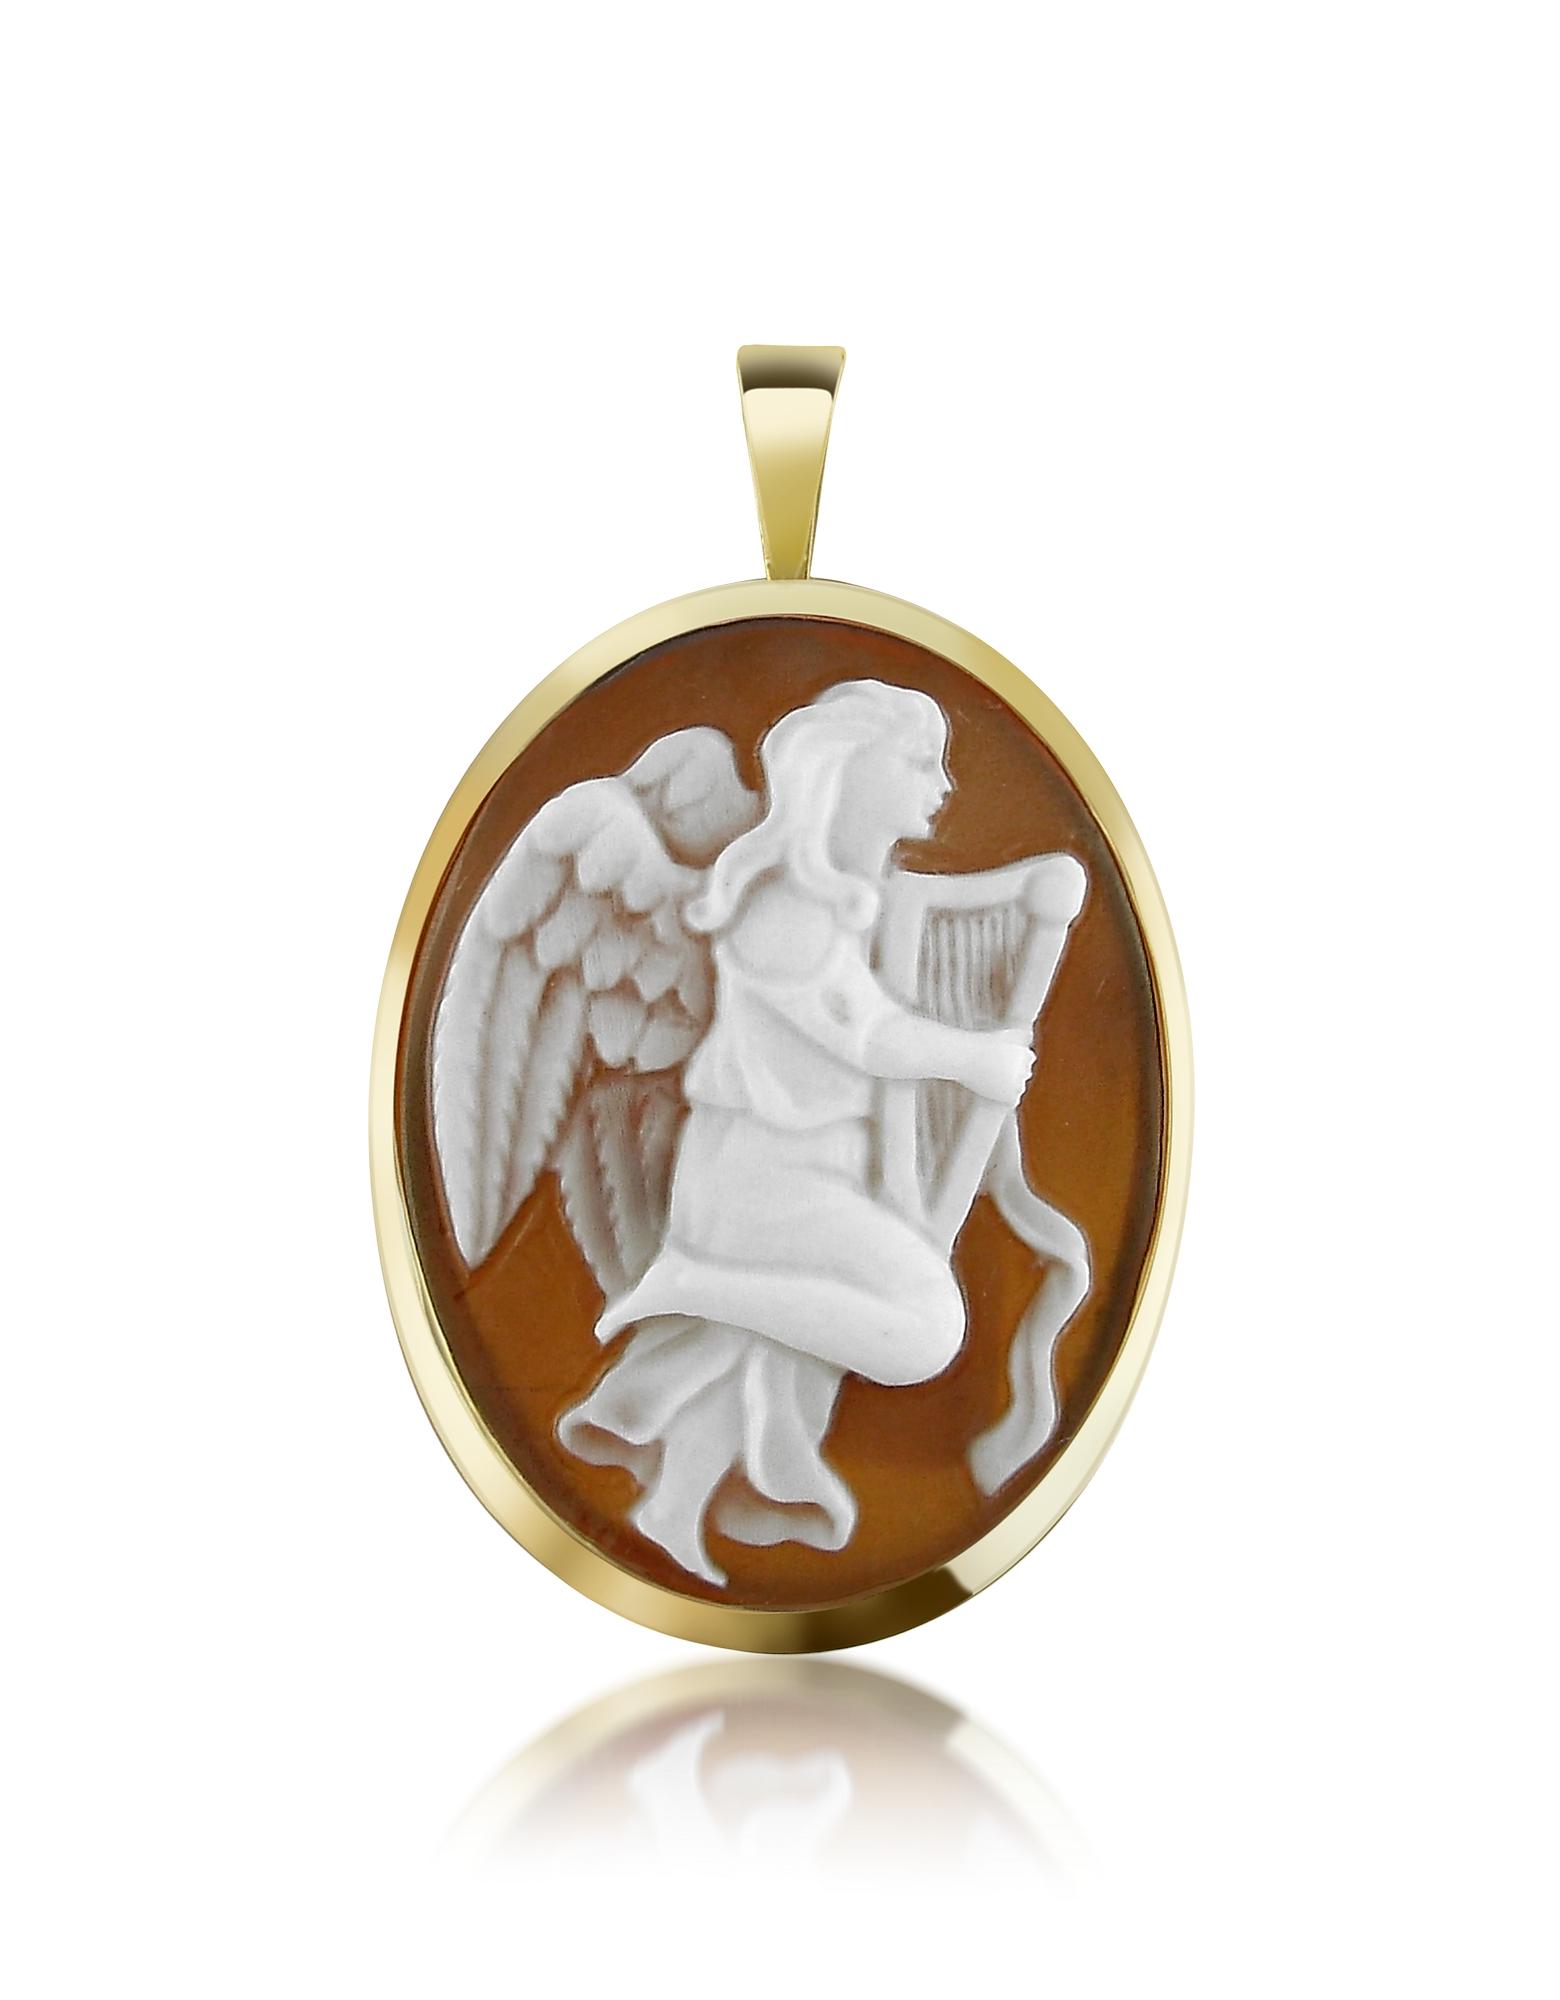 Del Gatto Cameo, Angel with Lyre Sardonyx Cameo Pendant/Pin